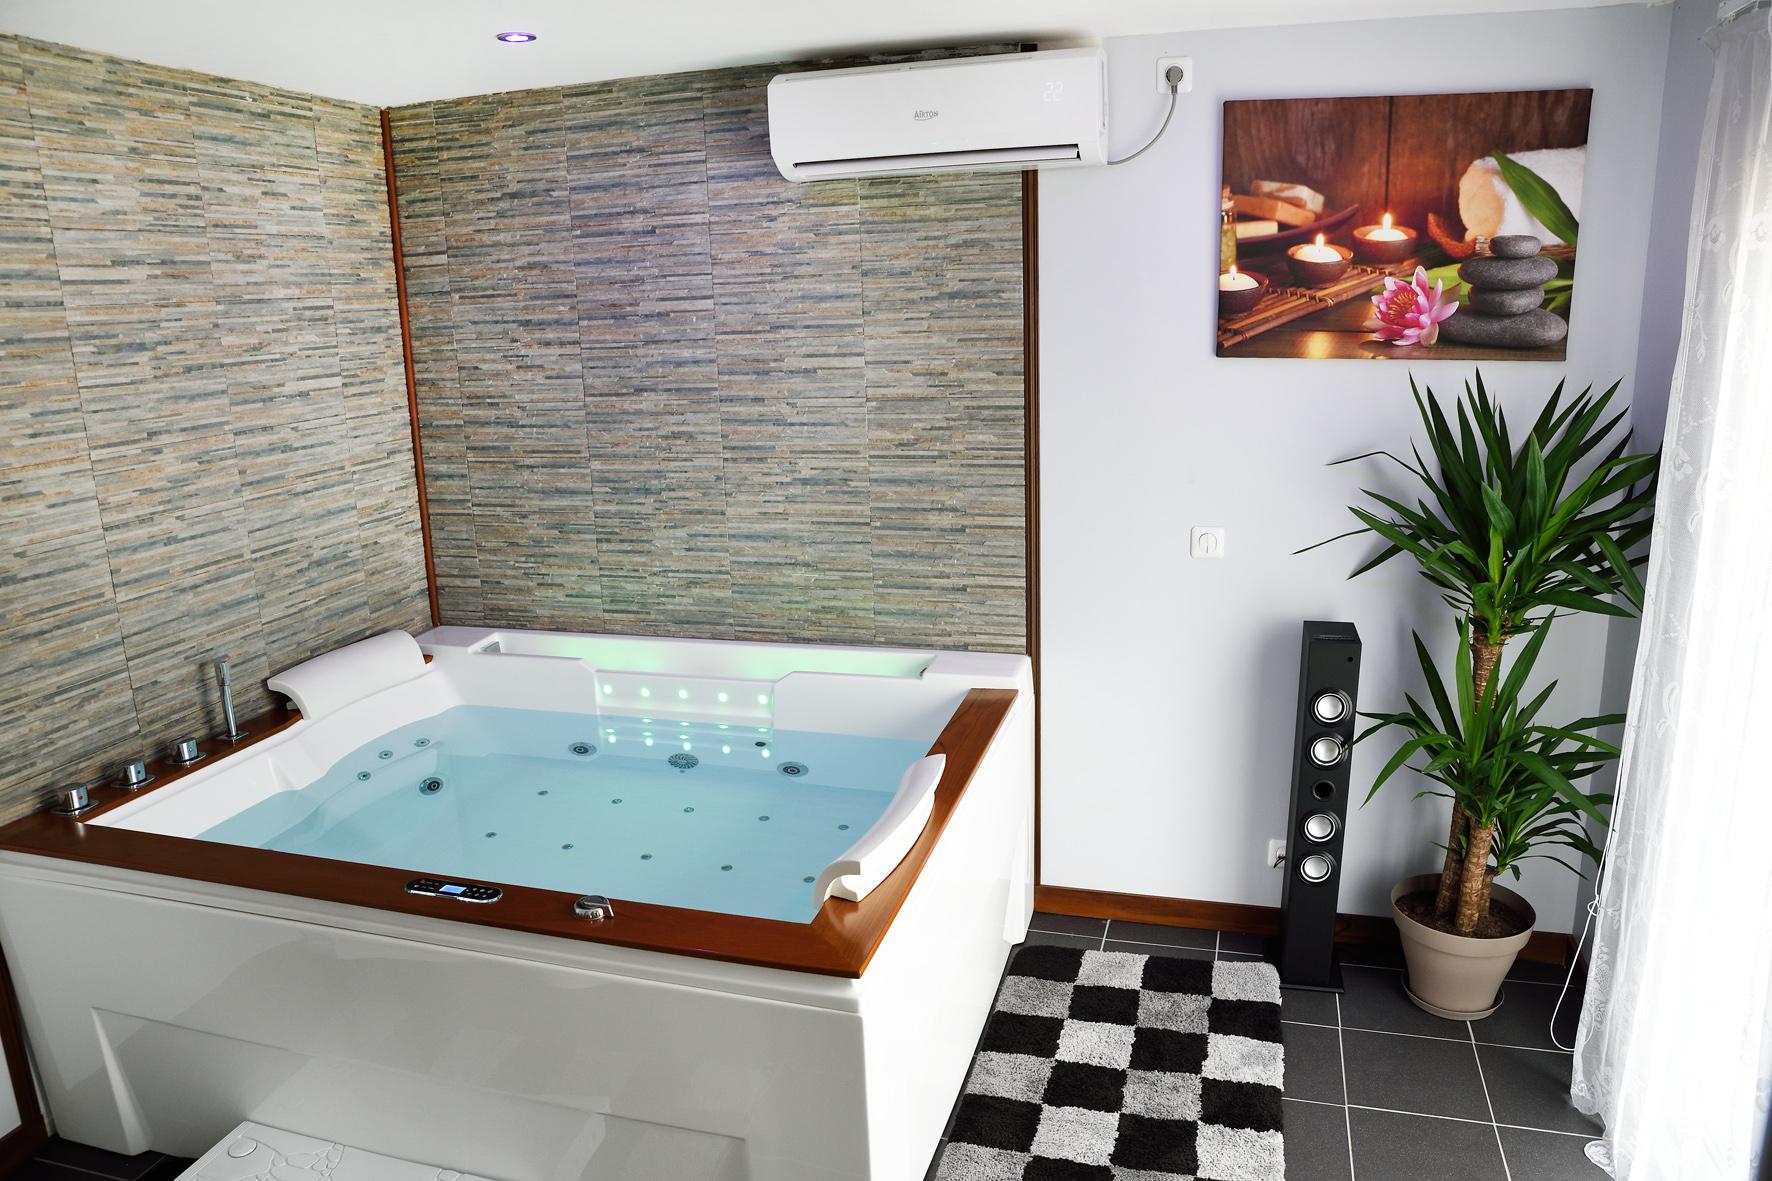 Awesome salle de bain de luxe avec jacuzzi gallery for Chambre de luxe avec jacuzzi